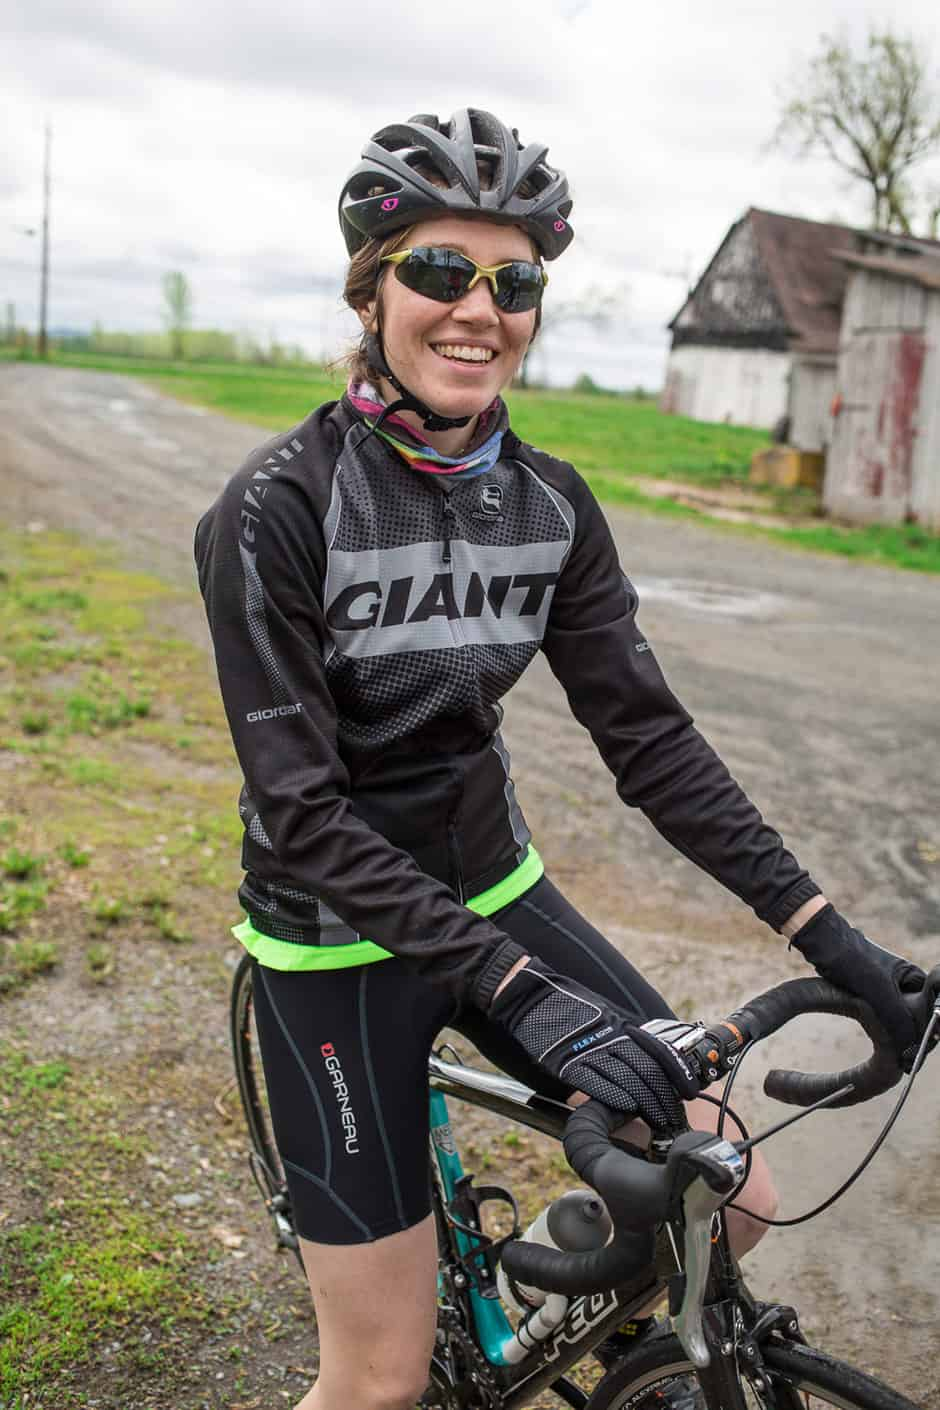 The 6 Essentials for Cycling: Louis Garneau Women's Sensor ...